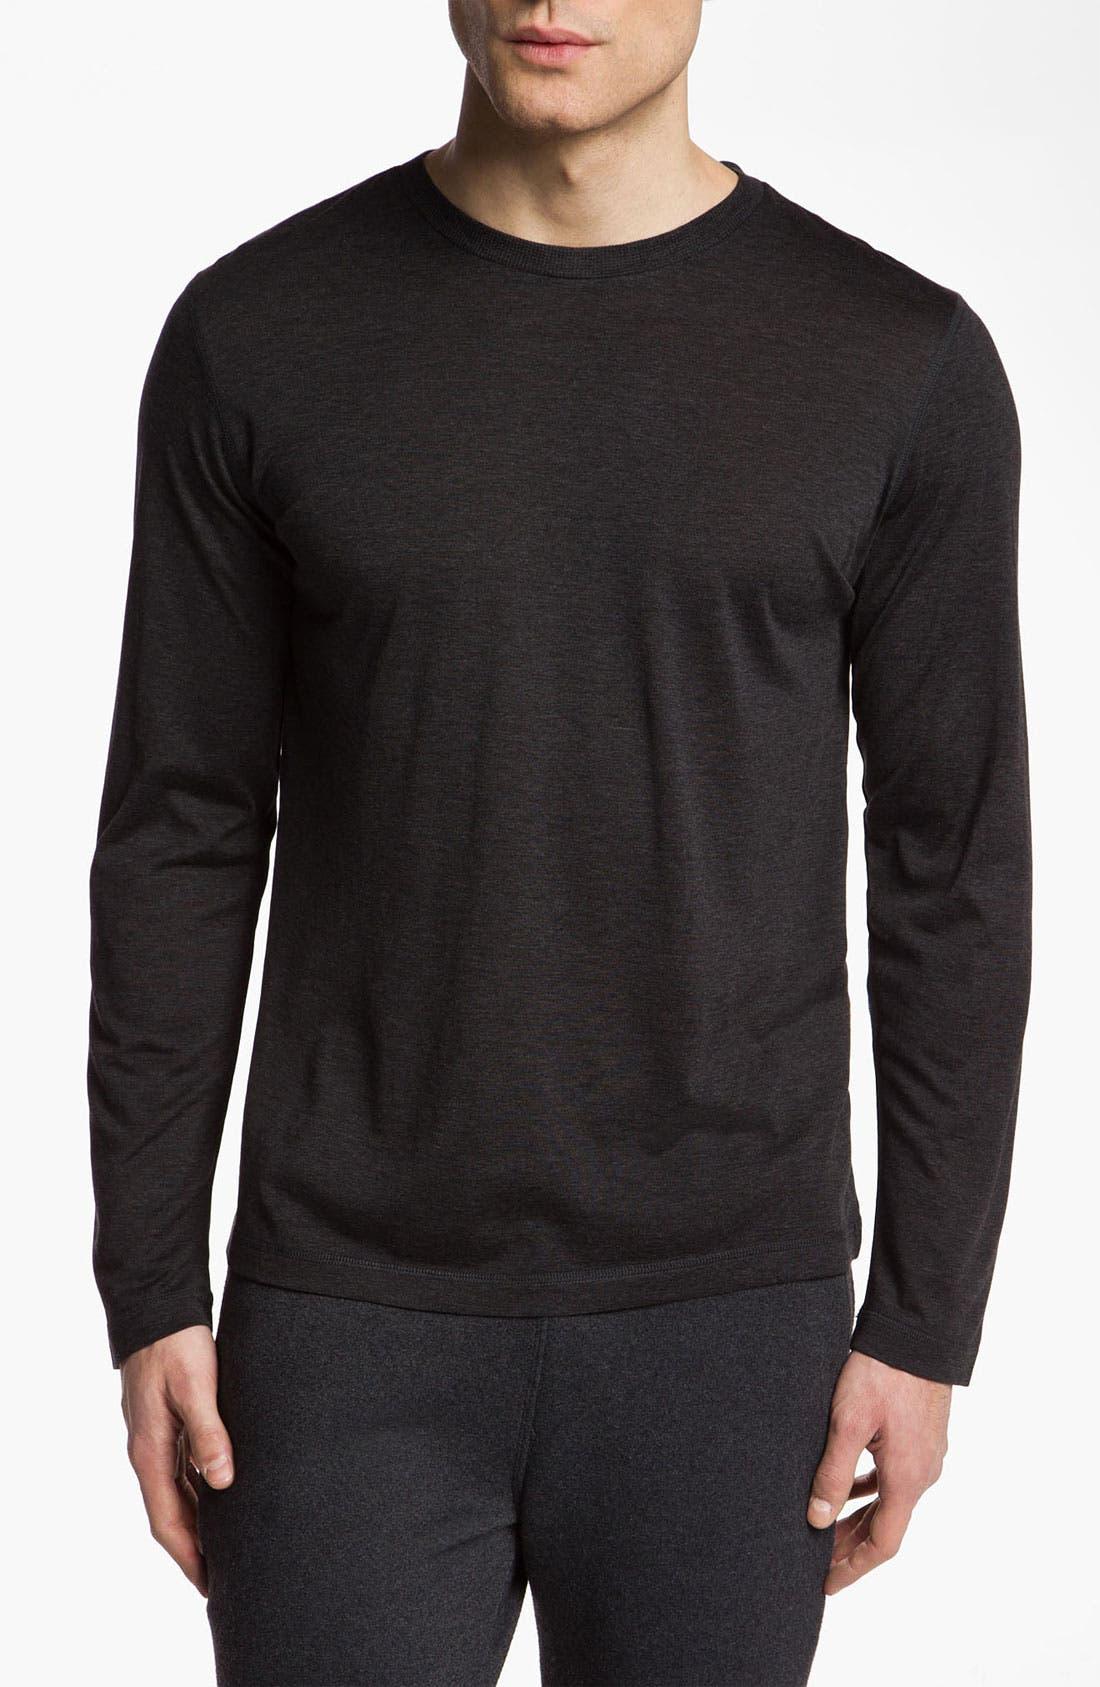 Main Image - Daniel Buchler Silk & Cotton Long Sleeve T-Shirt